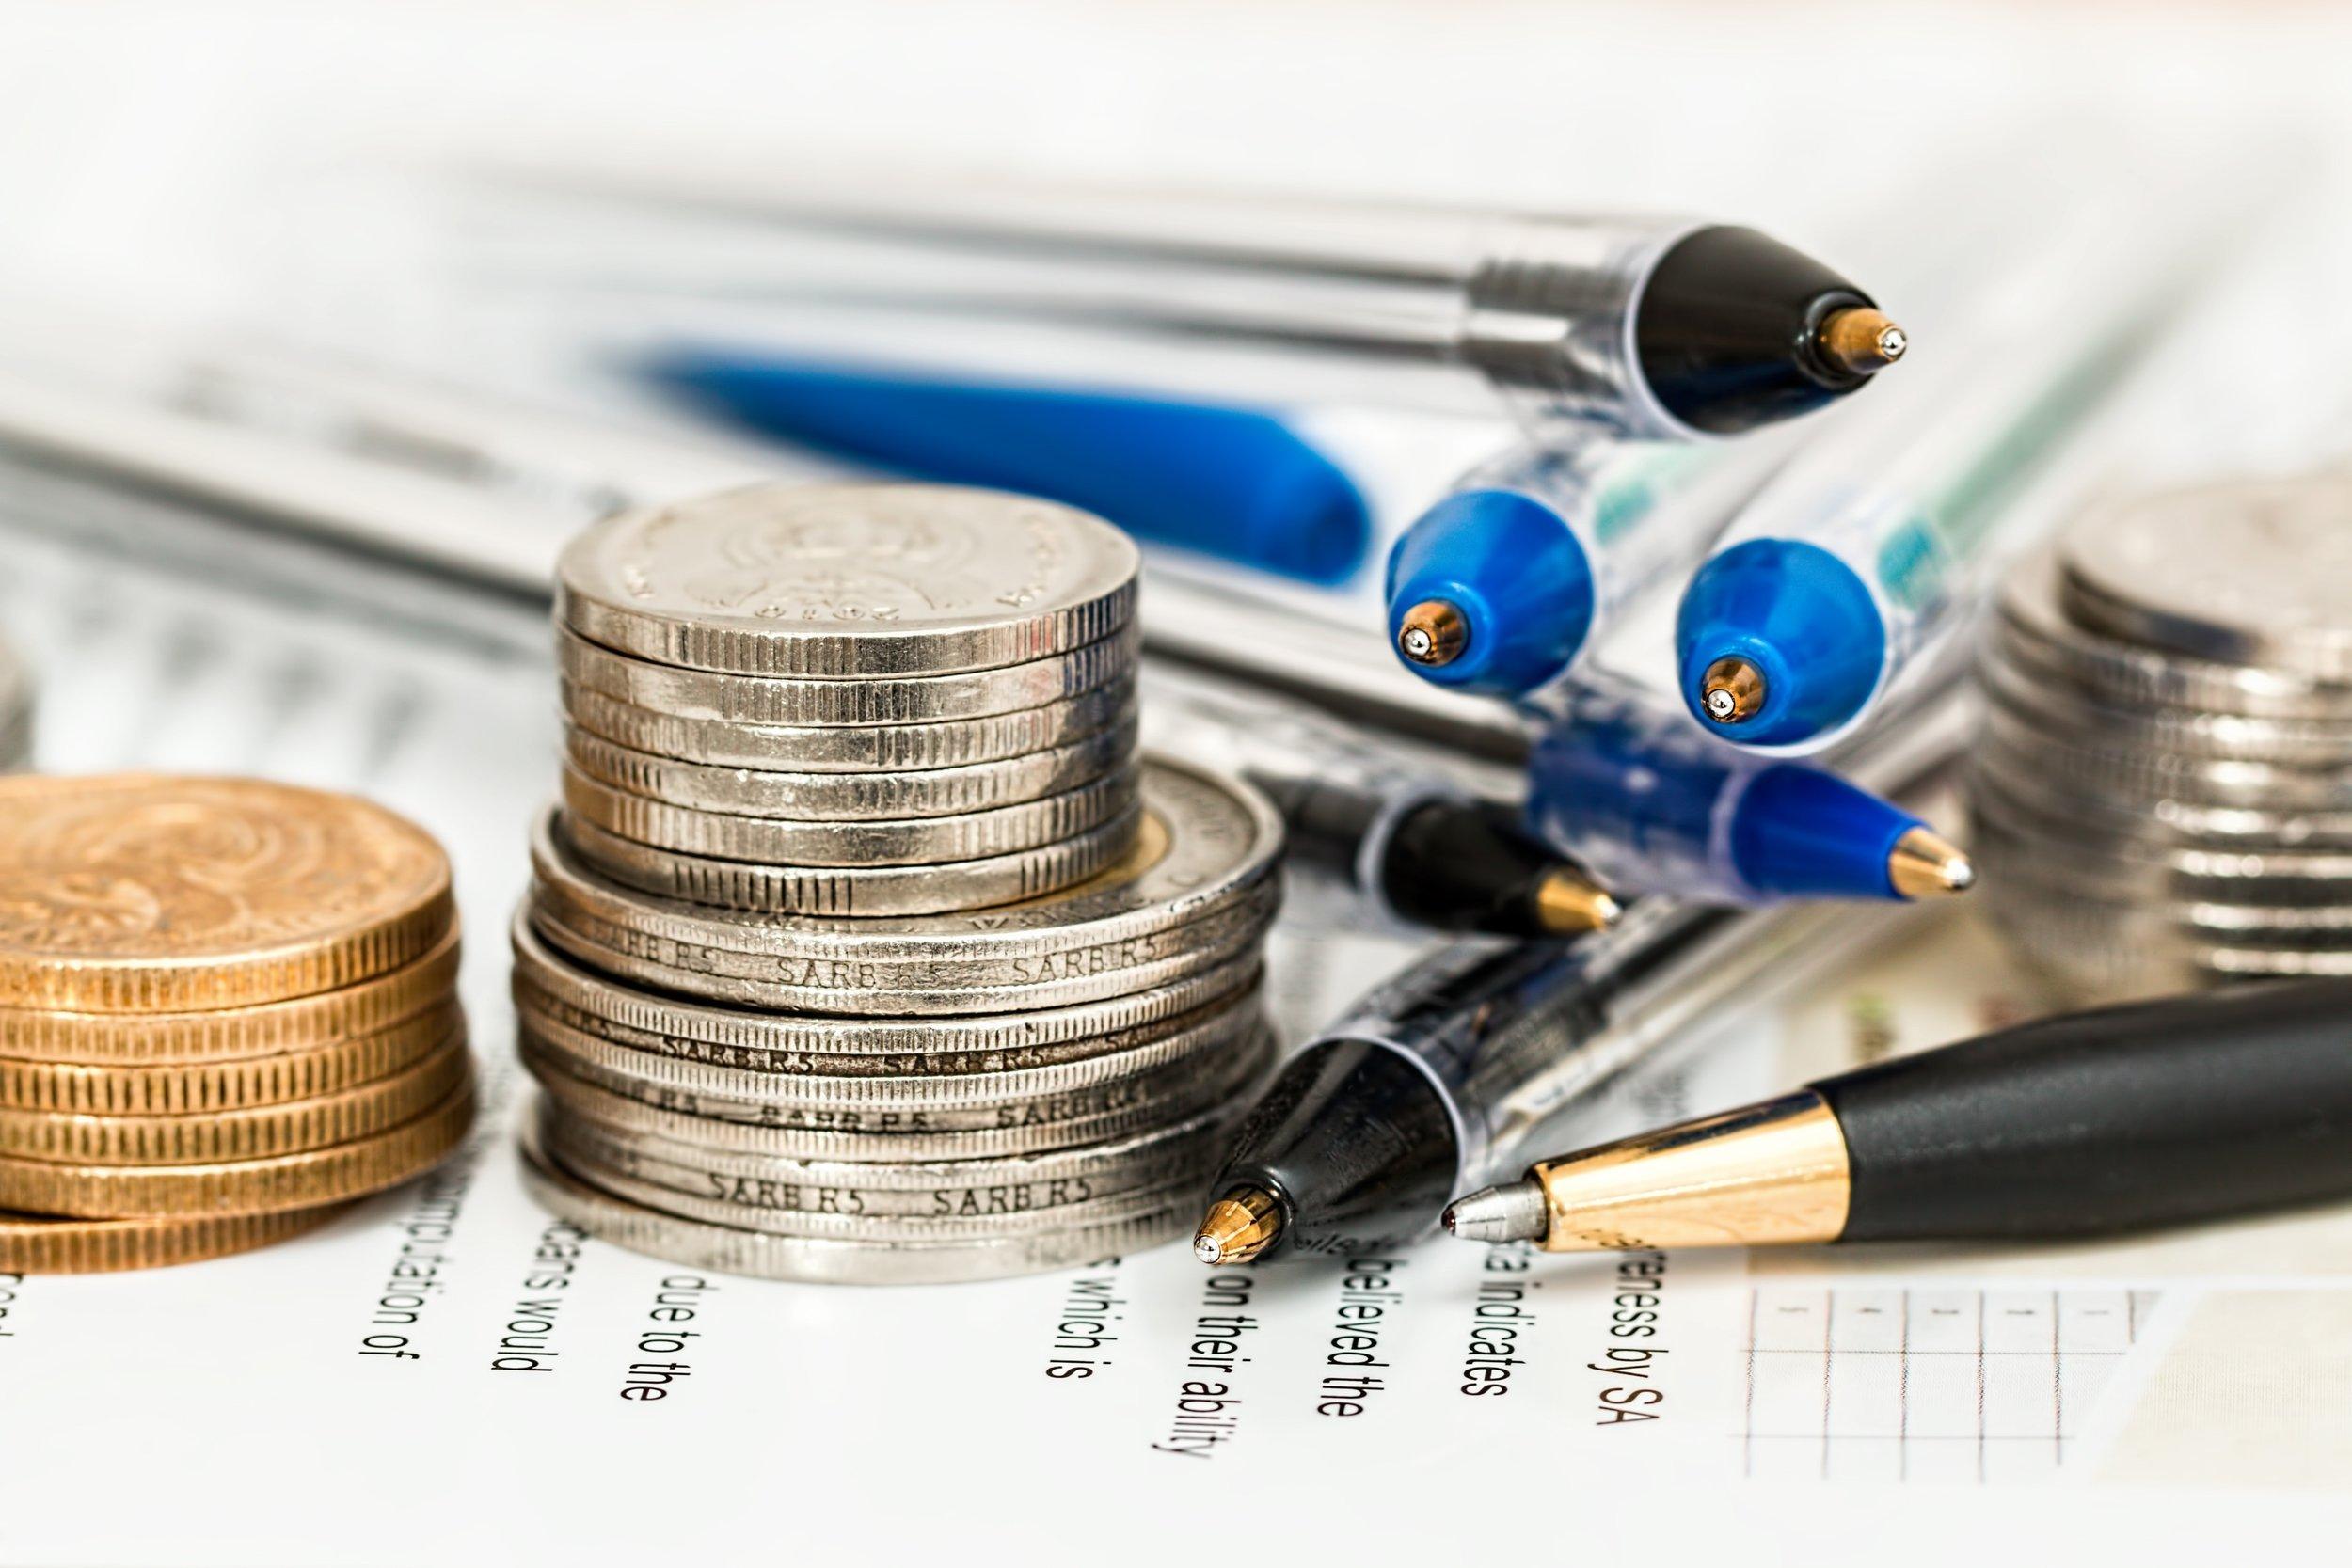 budget-cash-coins-33692.jpg